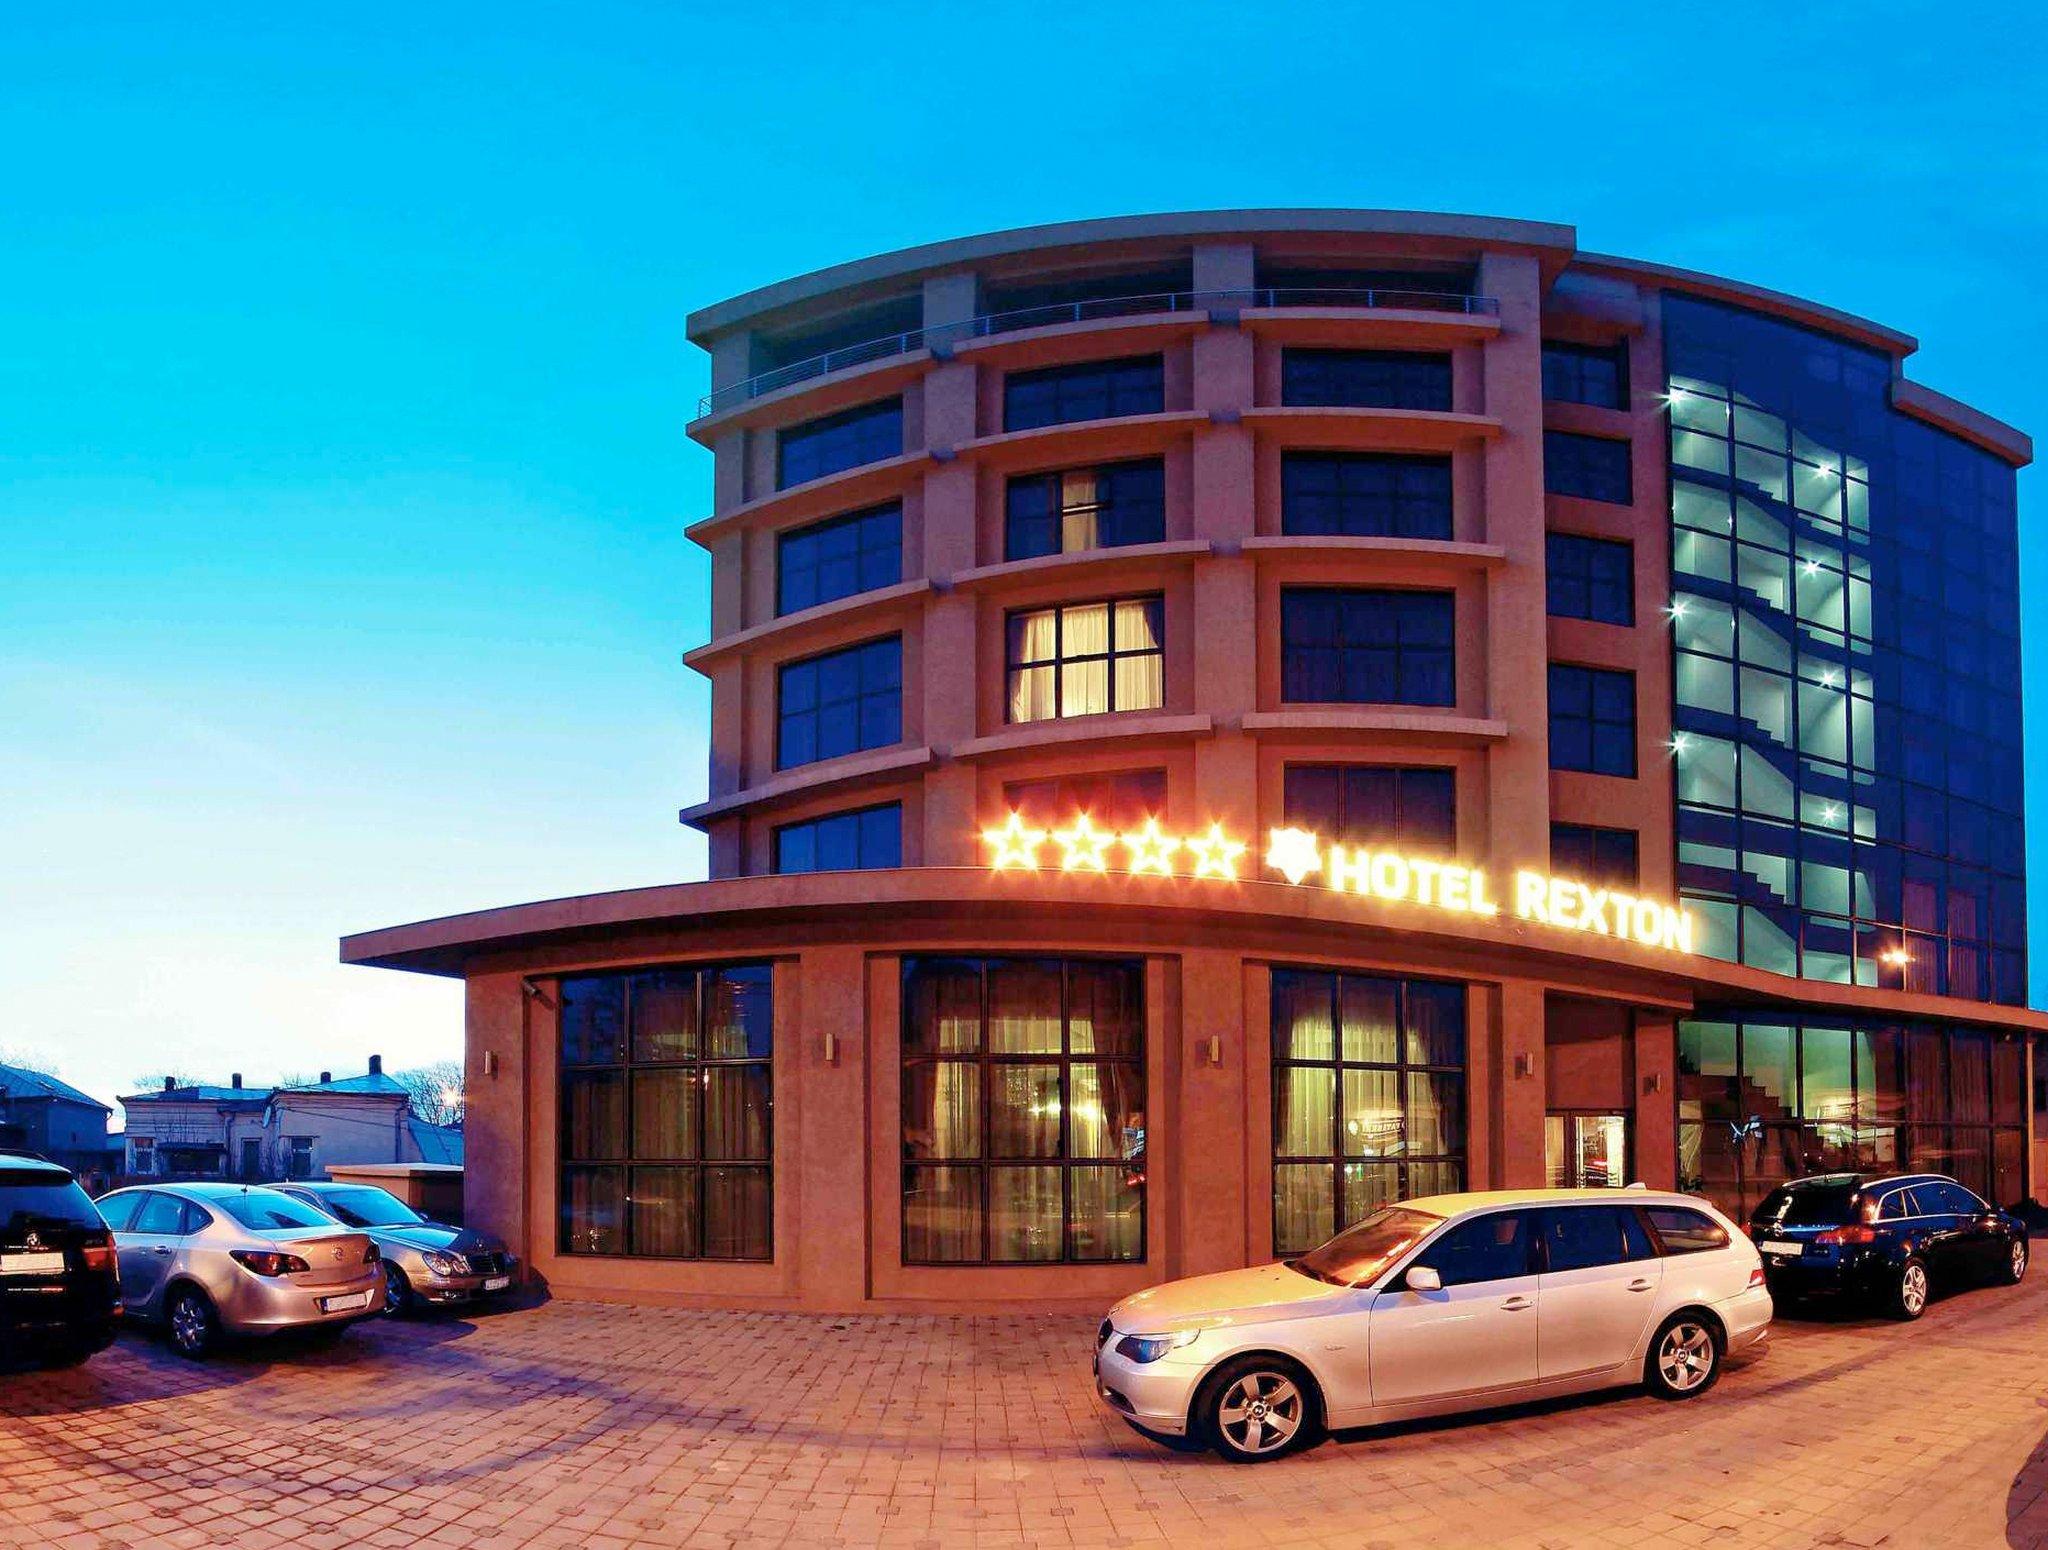 Rexton Hotel